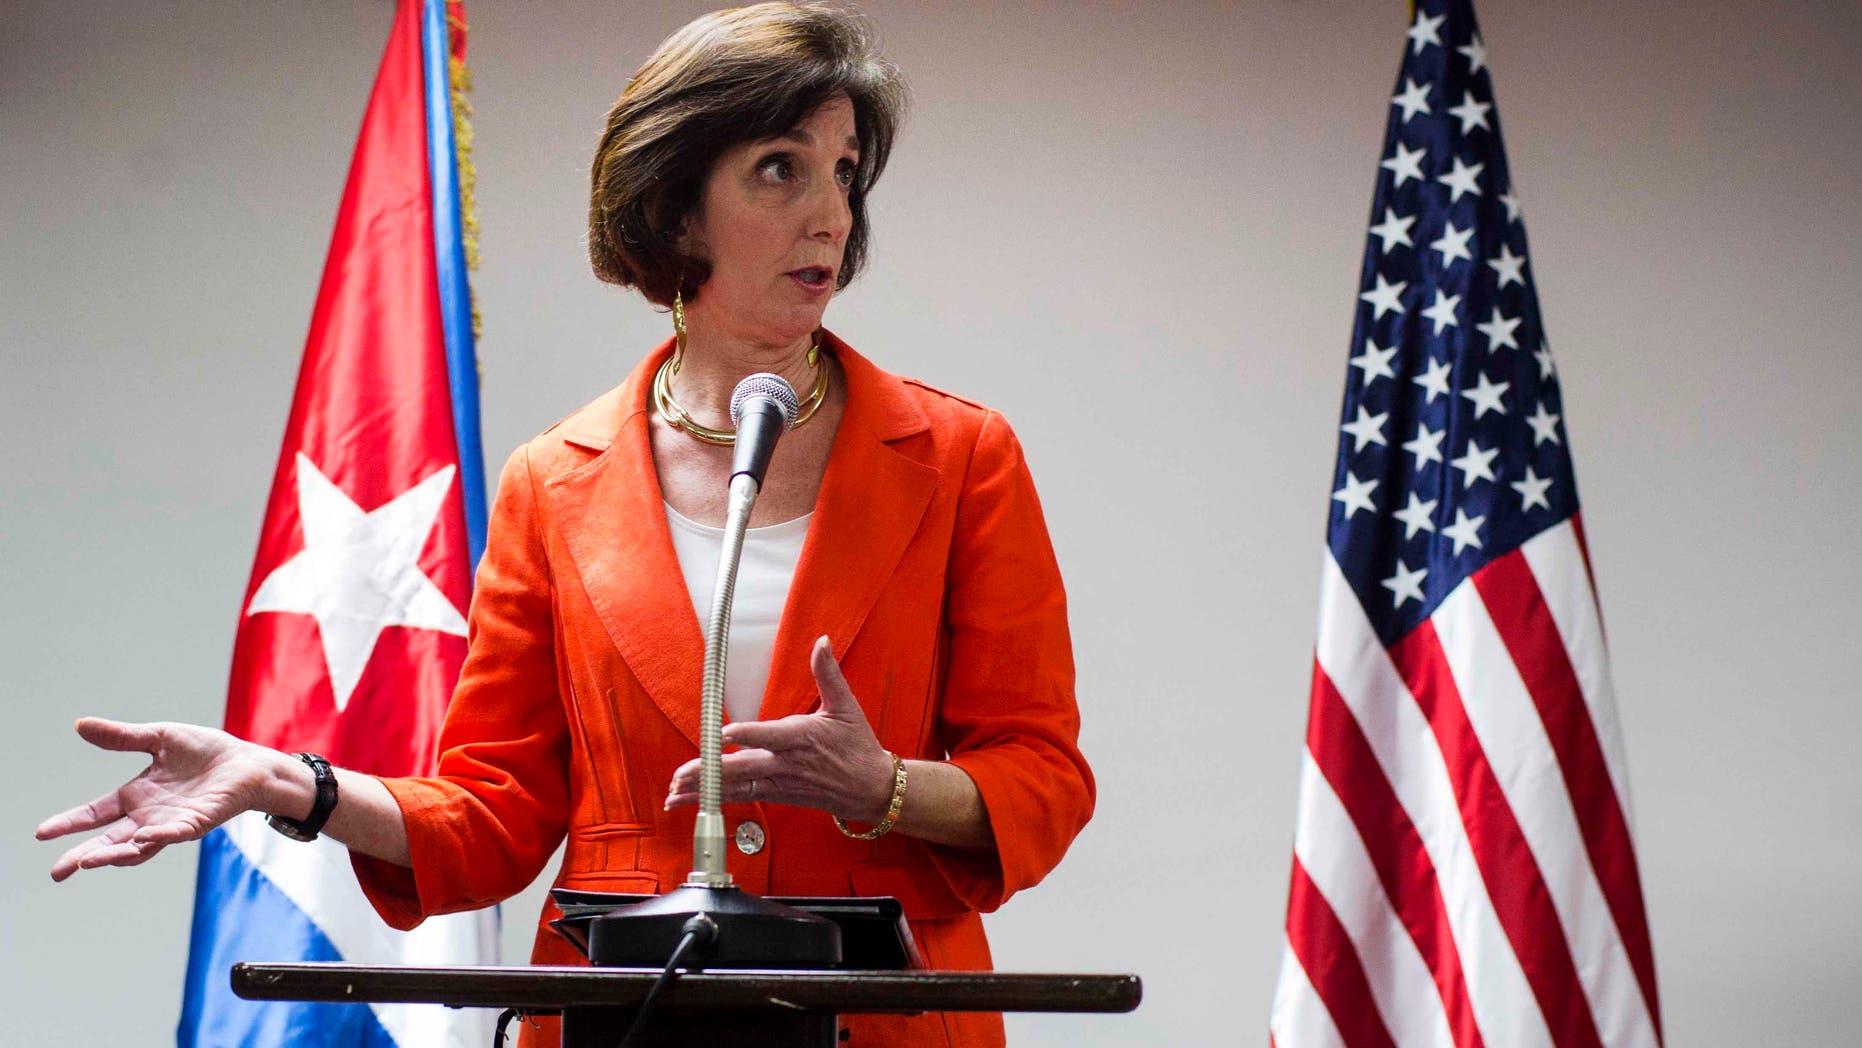 Assistant Secretary of State of the Bureau of Western Hemisphere Affairs, Roberta Jacobson, on Jan. 22, 2015.